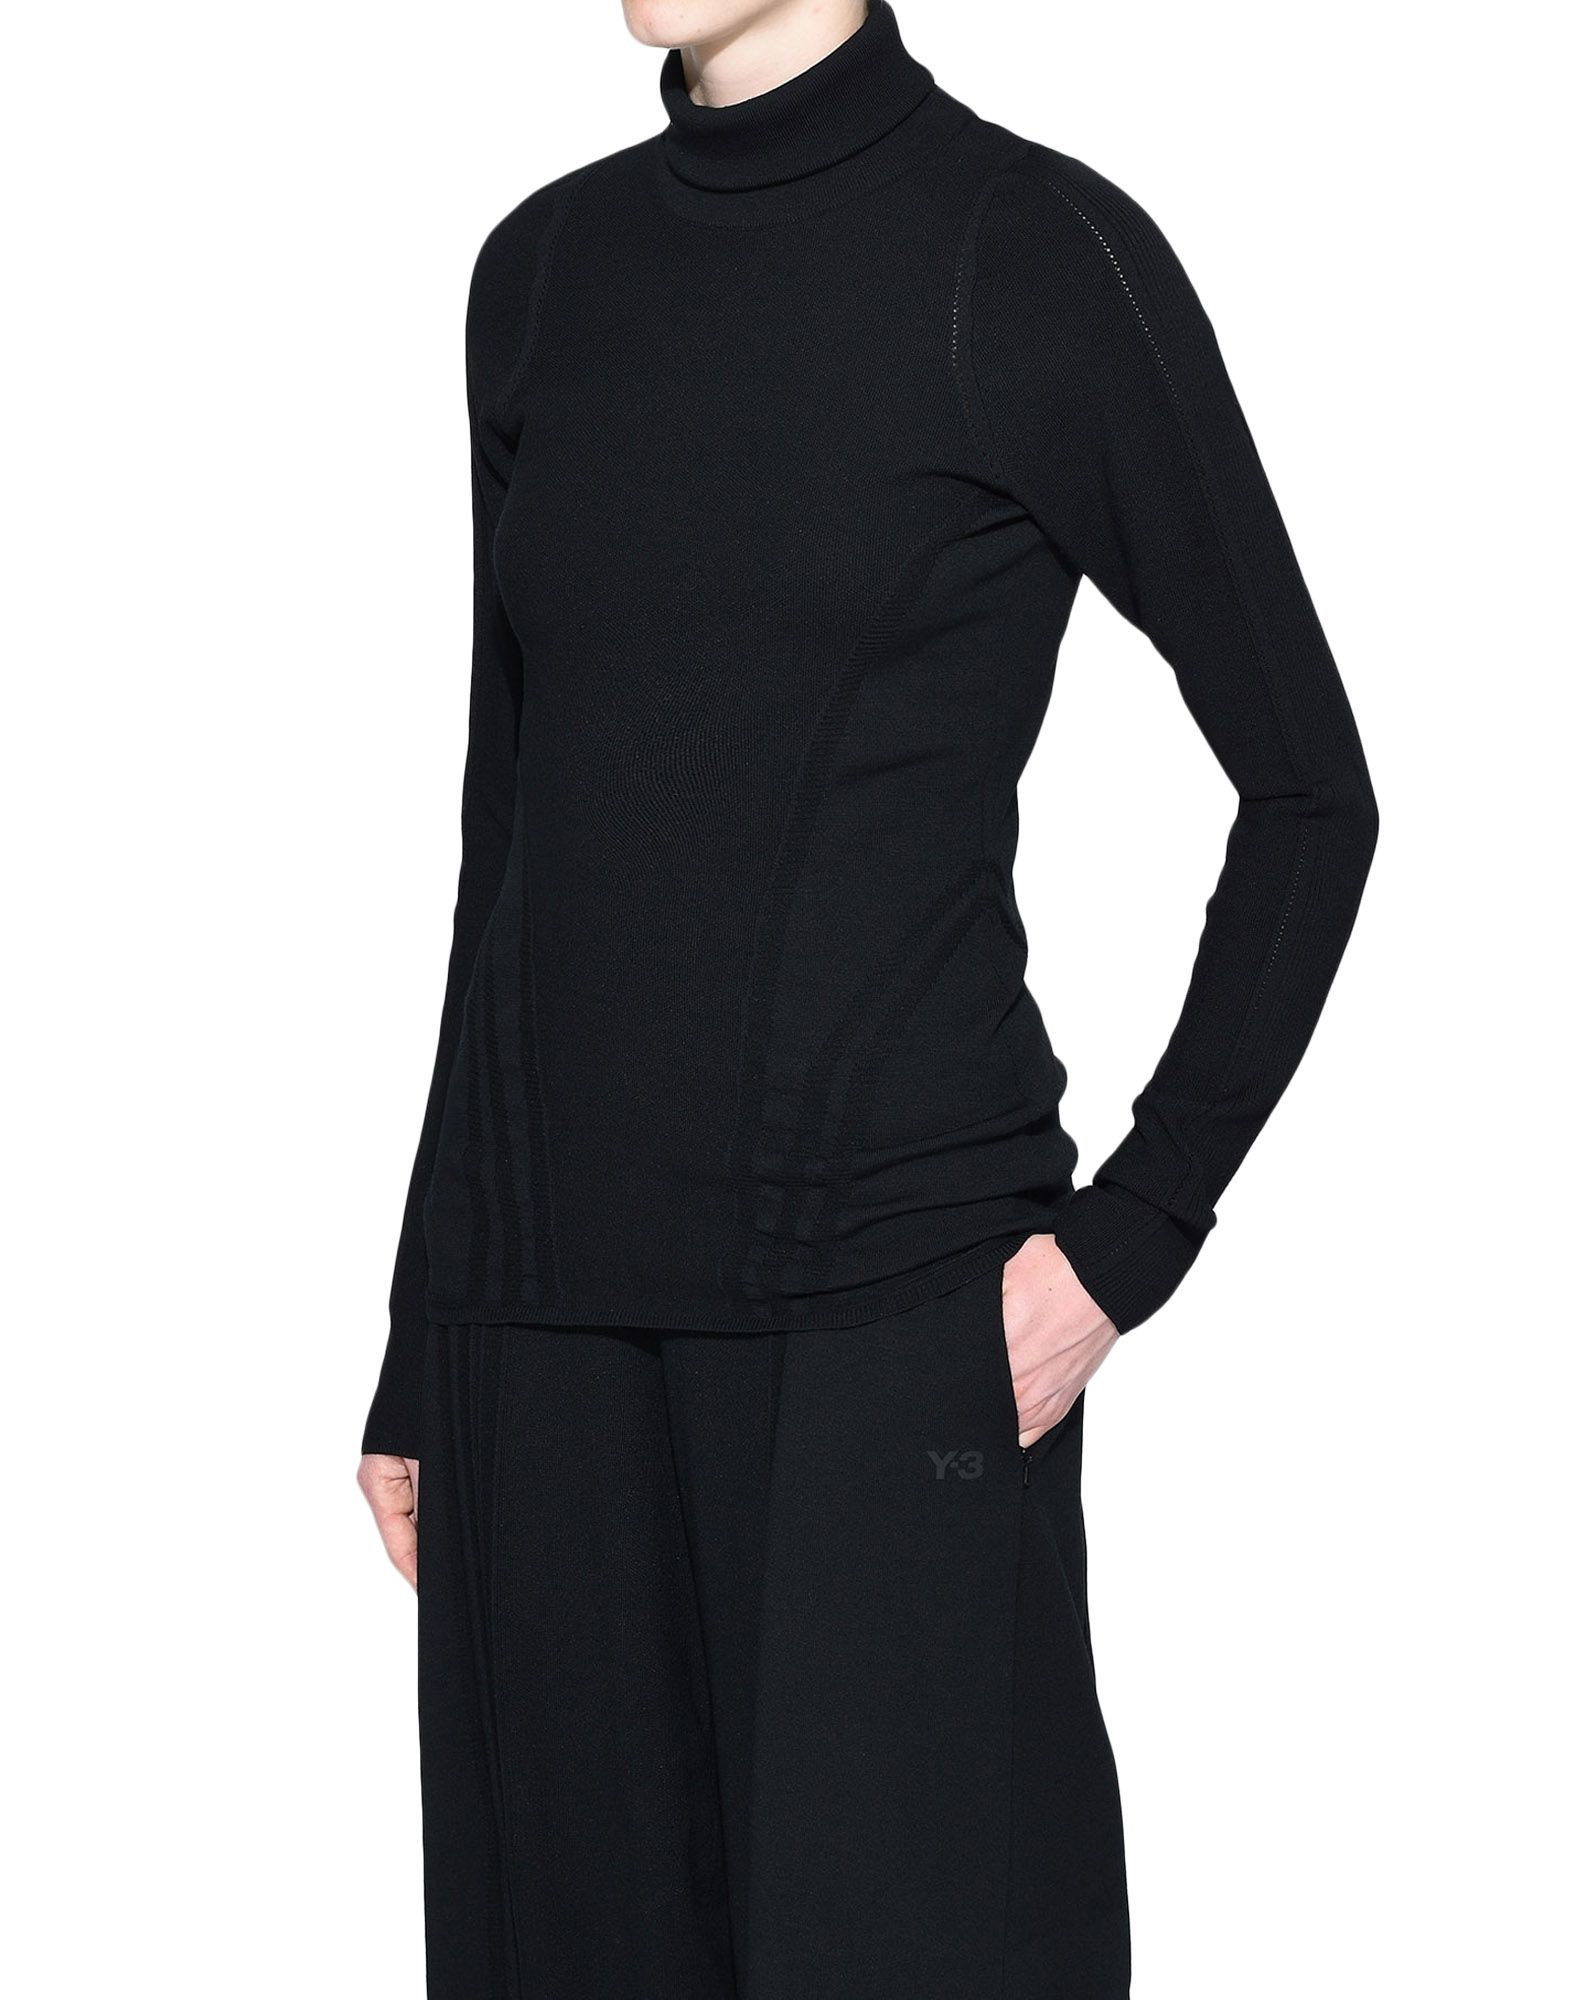 Y-3 Y-3 Tech Wool High Neck Tee Long sleeve t-shirt Woman e